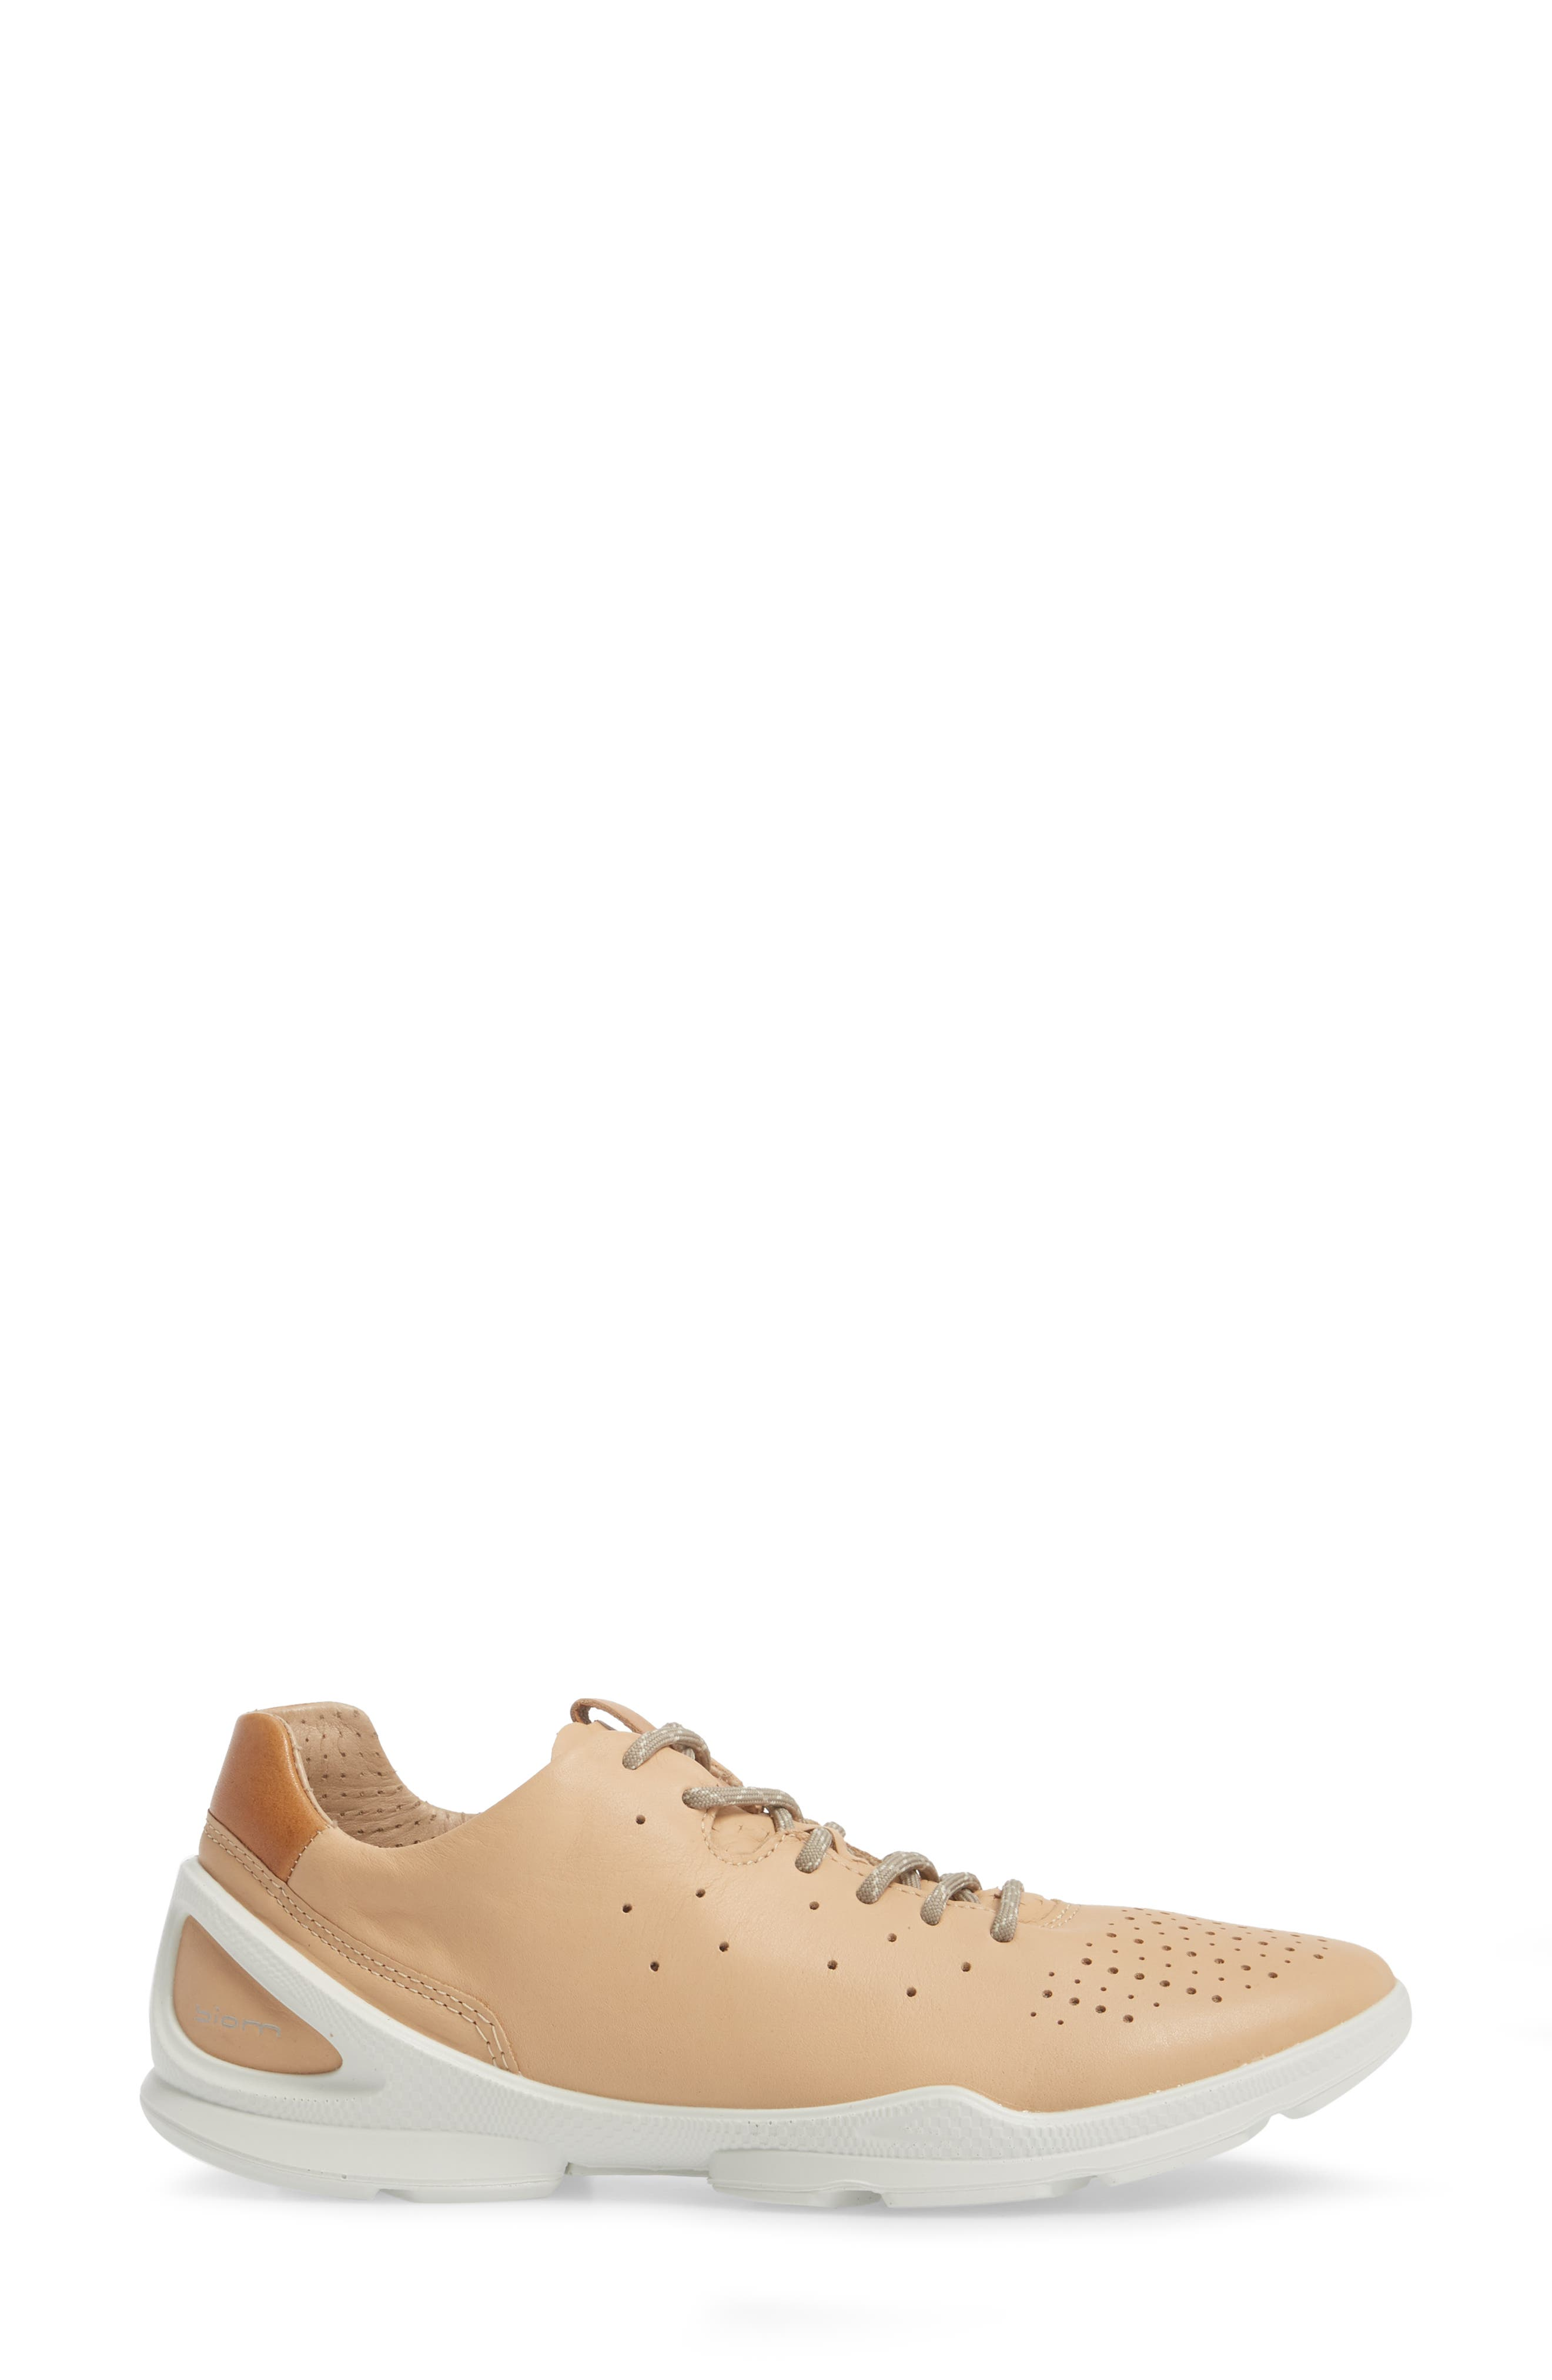 Biom Street Sneaker,                             Alternate thumbnail 3, color,                             024